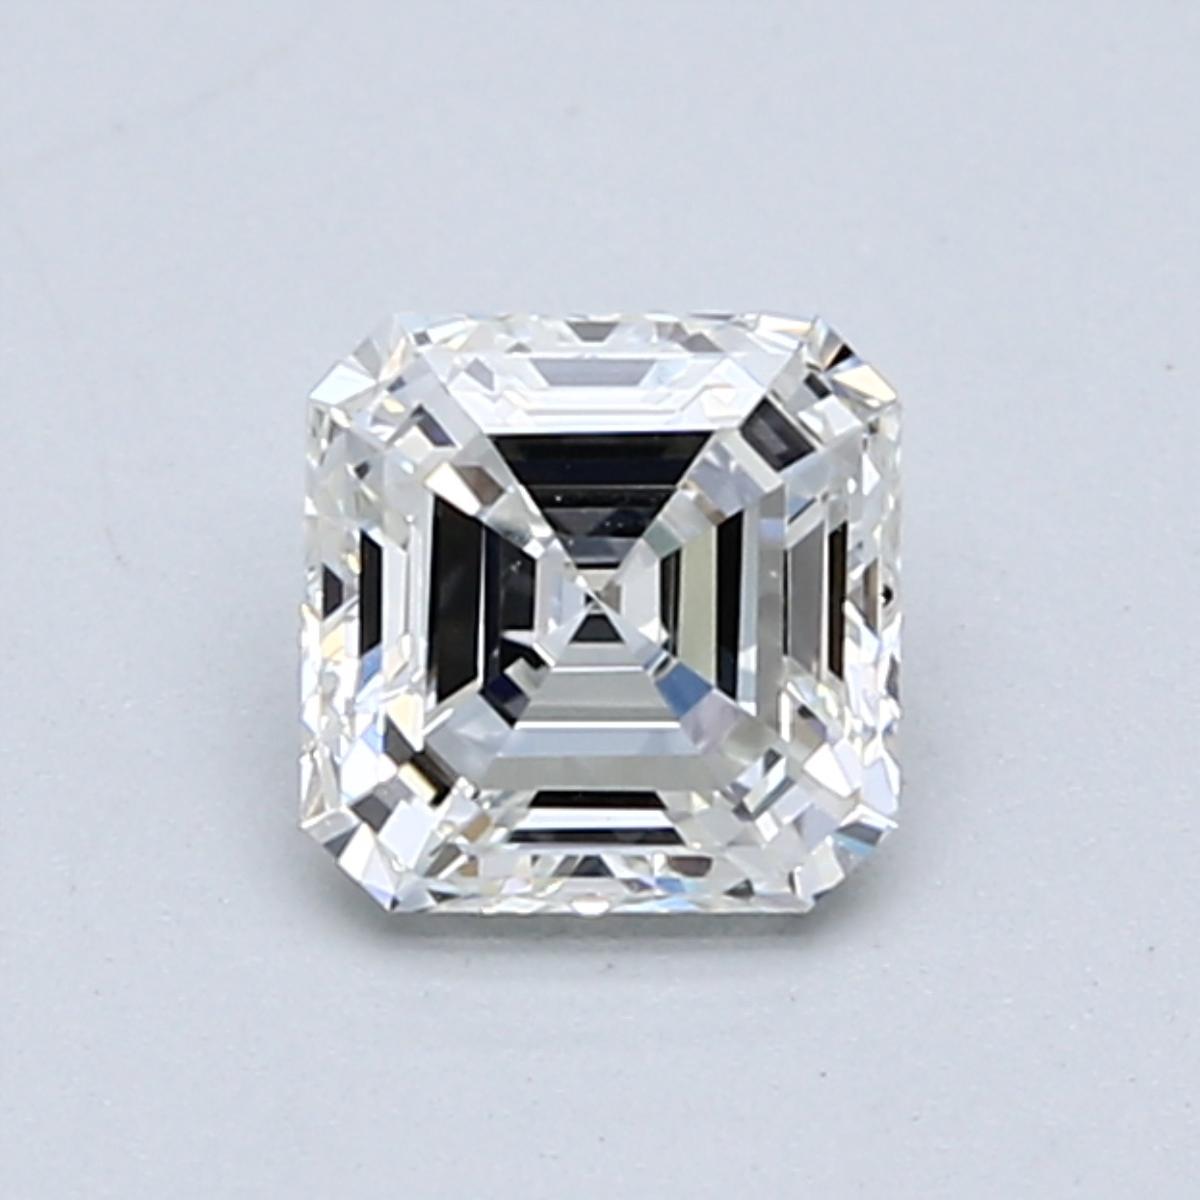 .75 carat Asscher Diamond, Very Good cut, graded by the GIA laboratories.